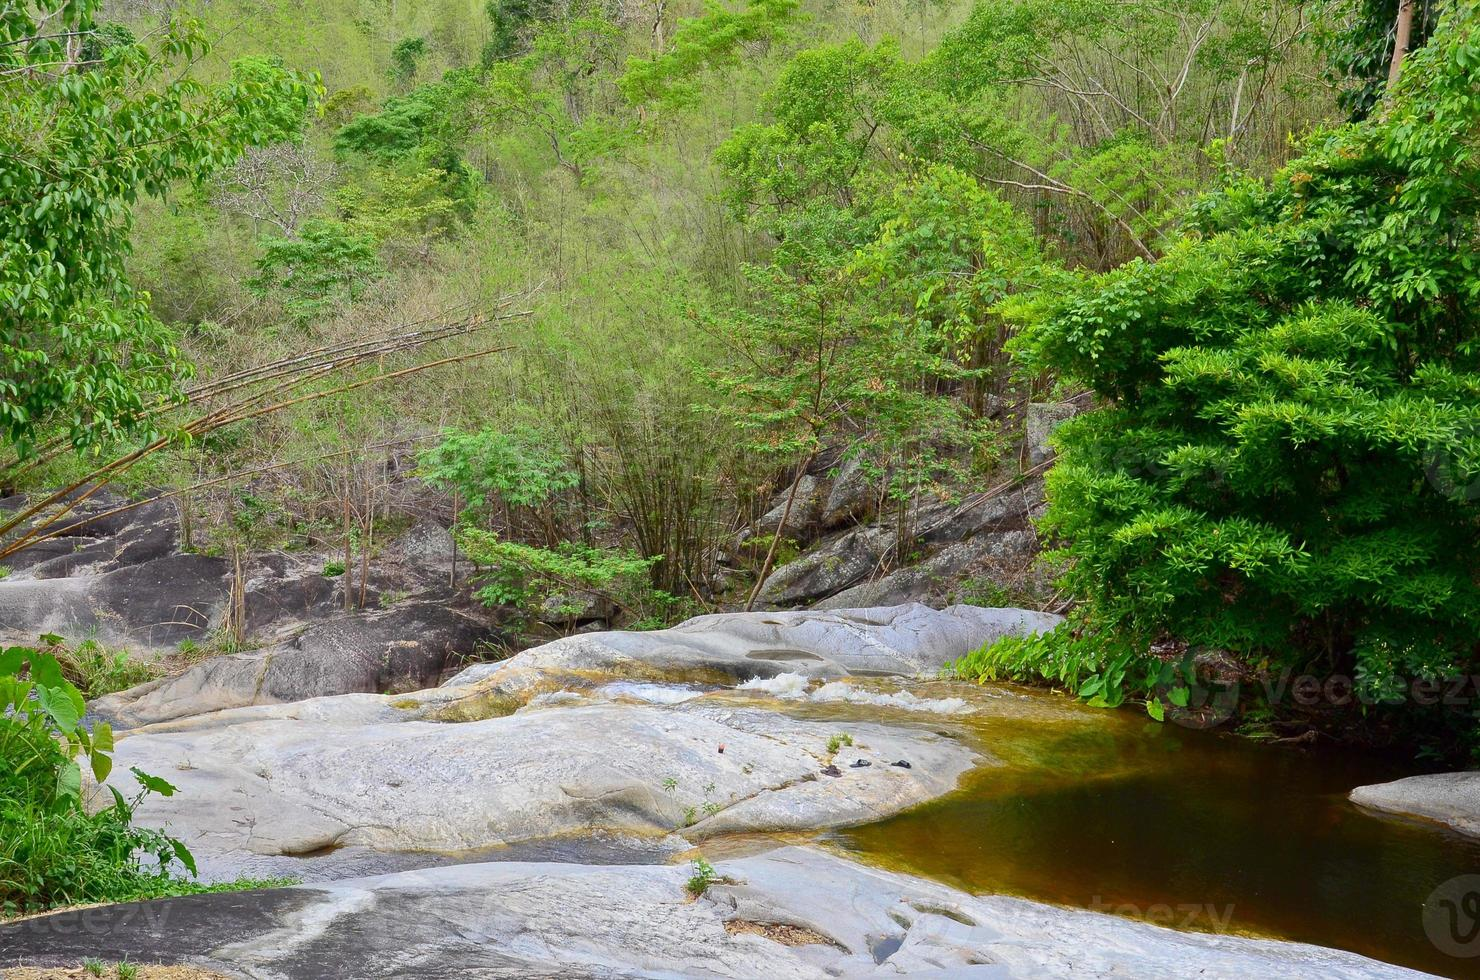 cascada de kao chon, suan phueng, ratchaburi, tailandia foto